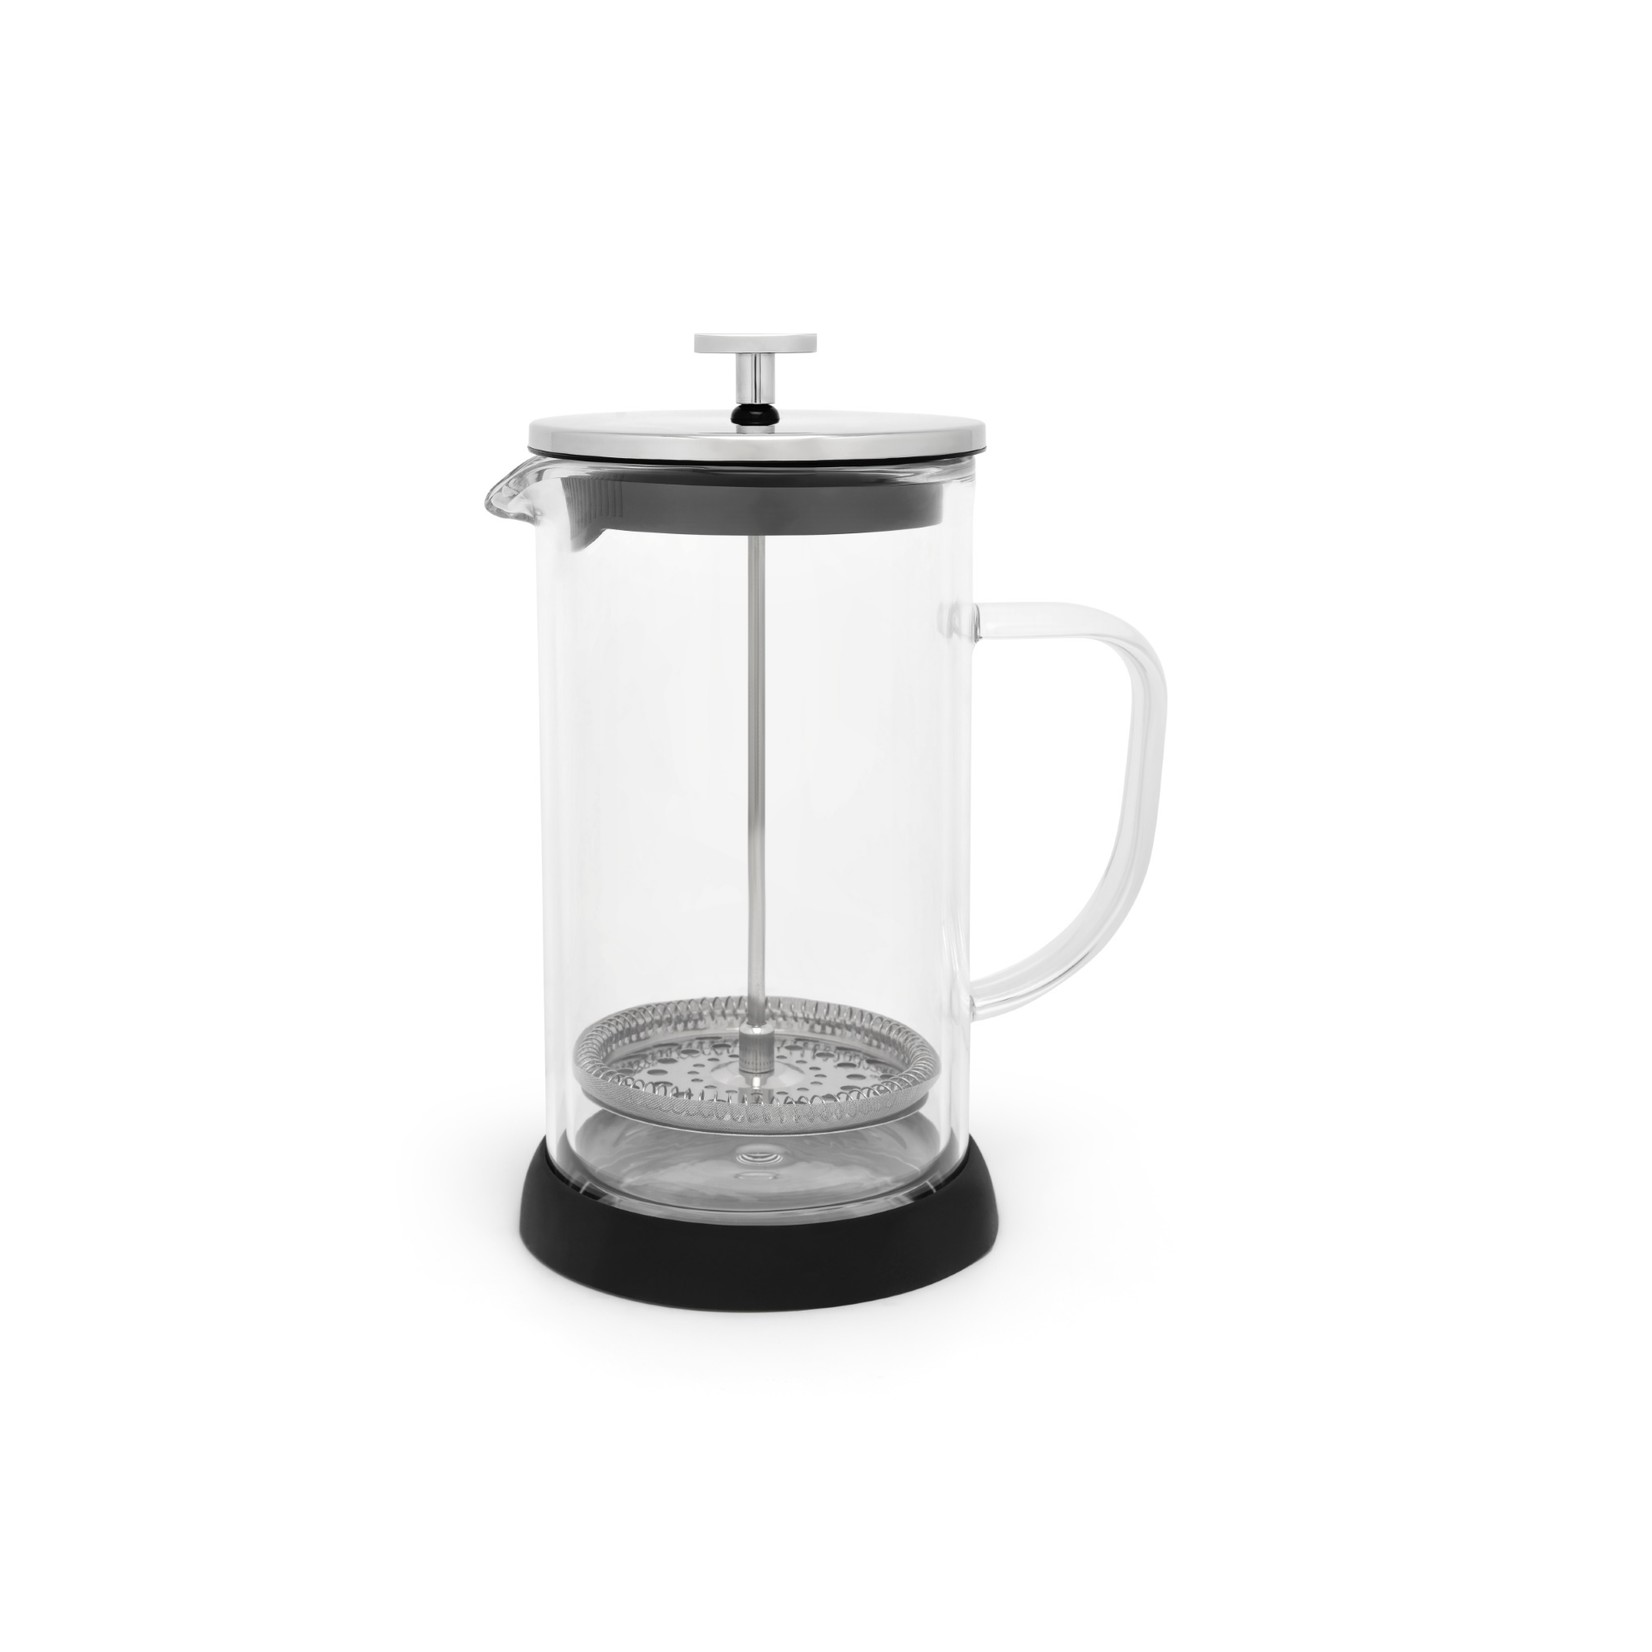 Bredemeijer Bredemeijer Overig theepotten Dubbelwandige thee/koffie press Florence 1,0L